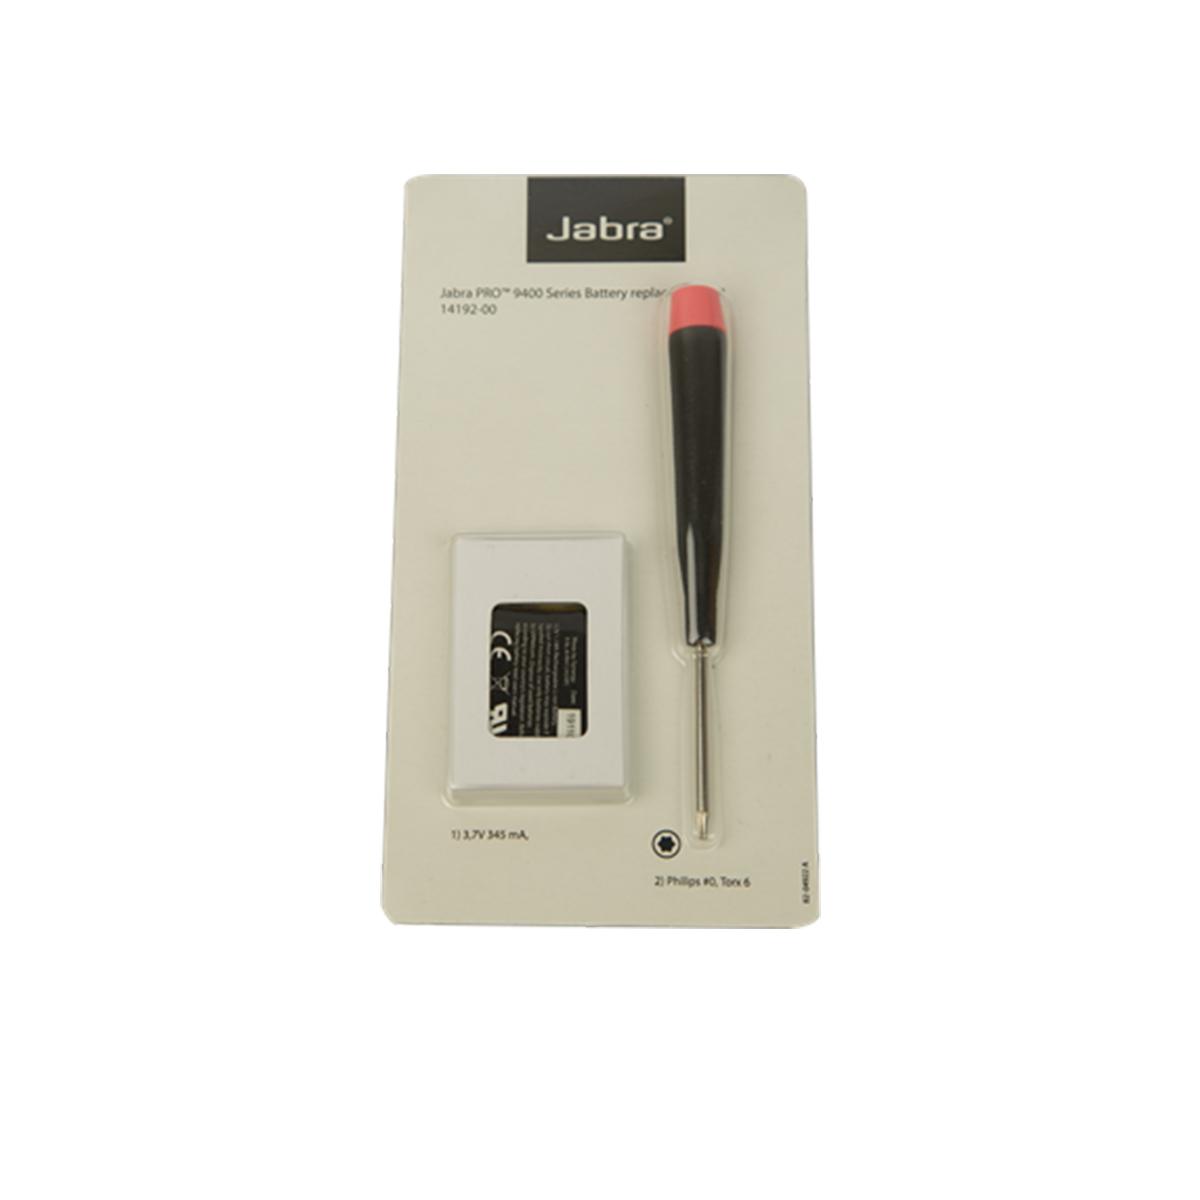 Jabra Spare Rechargable battery for PRO 9400